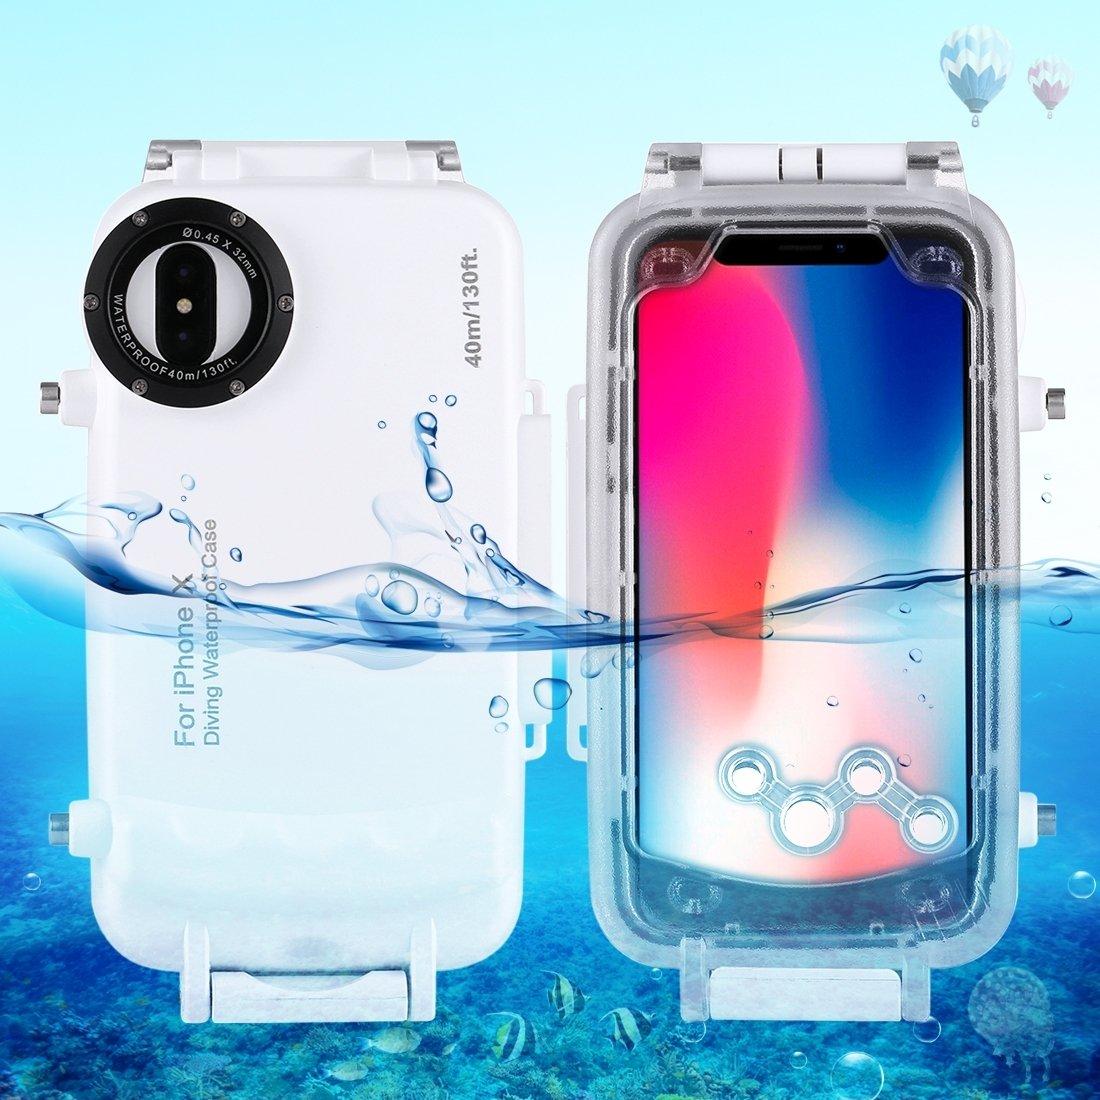 IPhone用40m / 130ft防水ダイビングハウジング写真の撮影水中カバーケース フォンケース. (Color : 白)   B07D2C3DN8